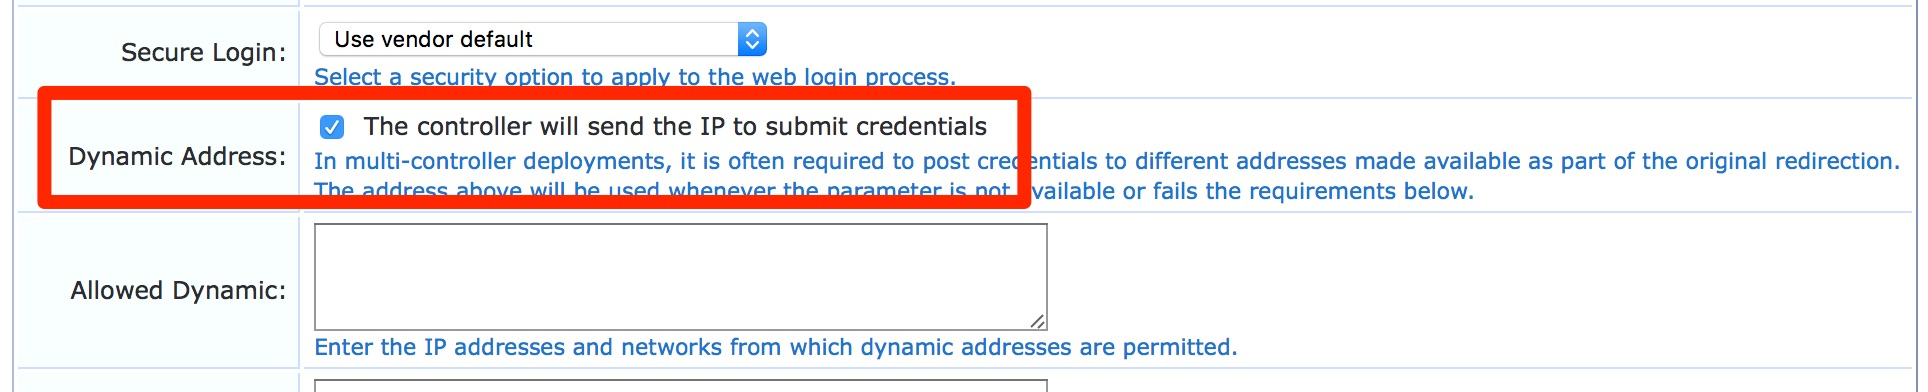 web_login__guest_portal_dynamic_address.jpg